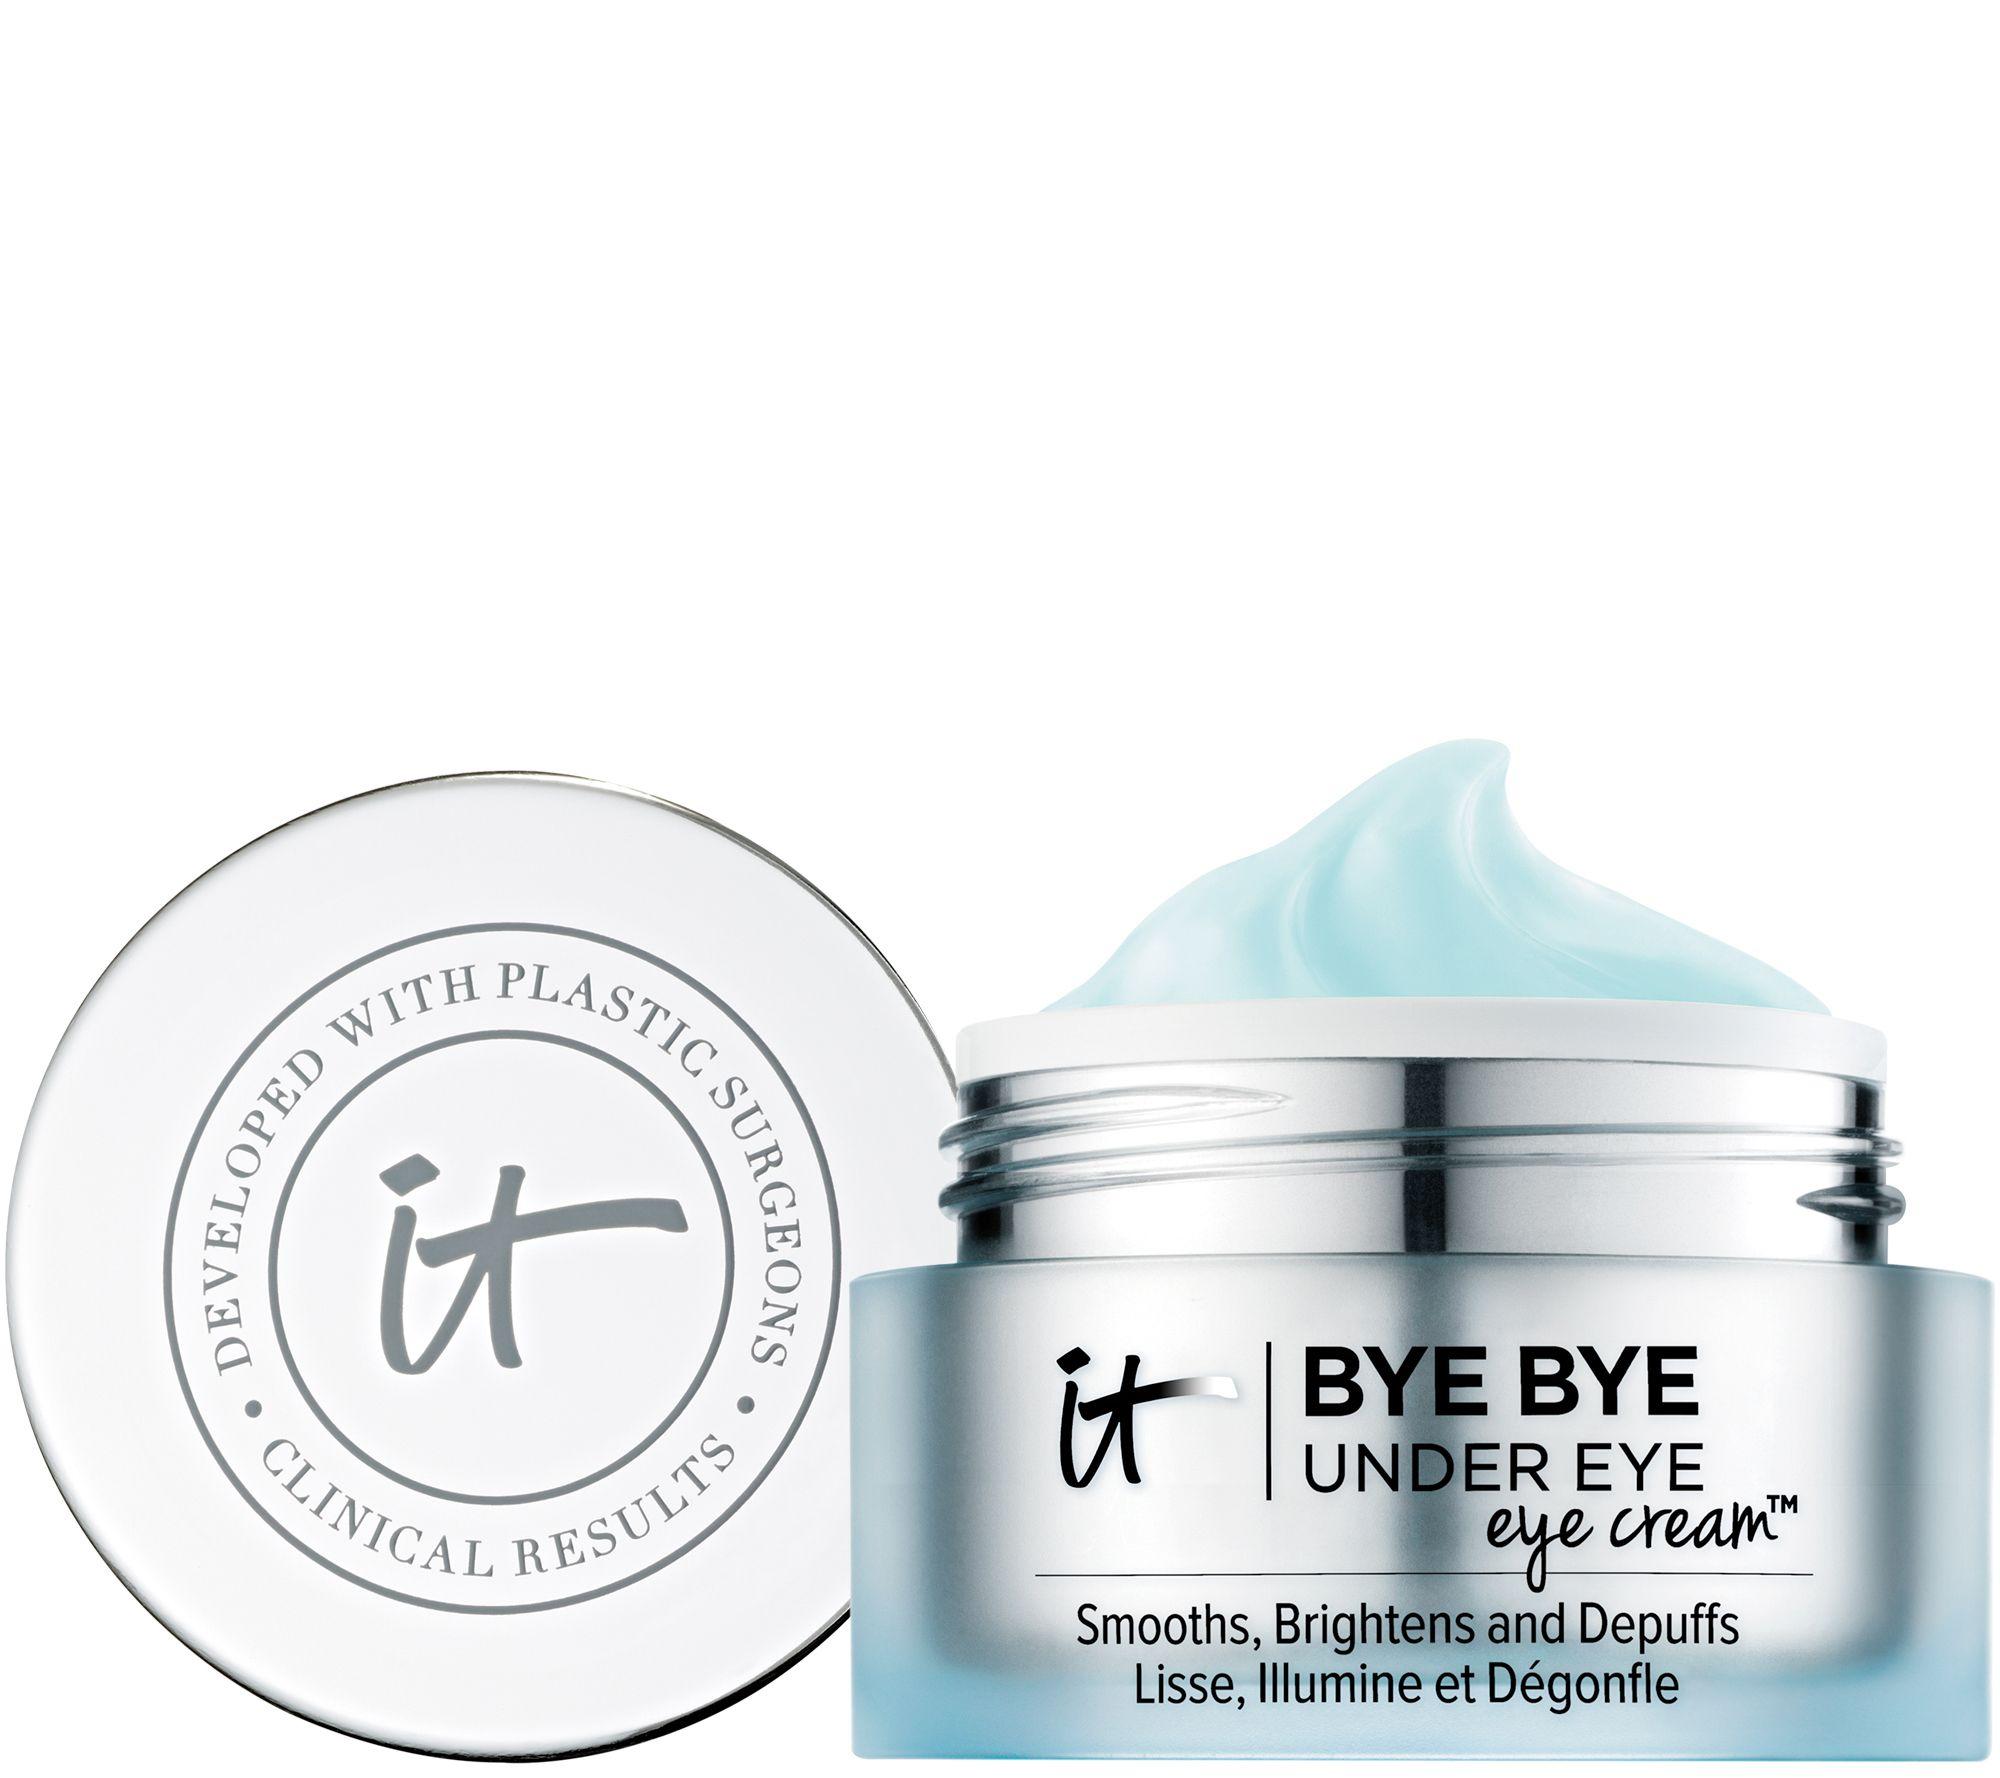 Step 2: IT COSMETICS  Bye Bye Under Eye Eye Cream™ Smooths, Brightens, Depuffs